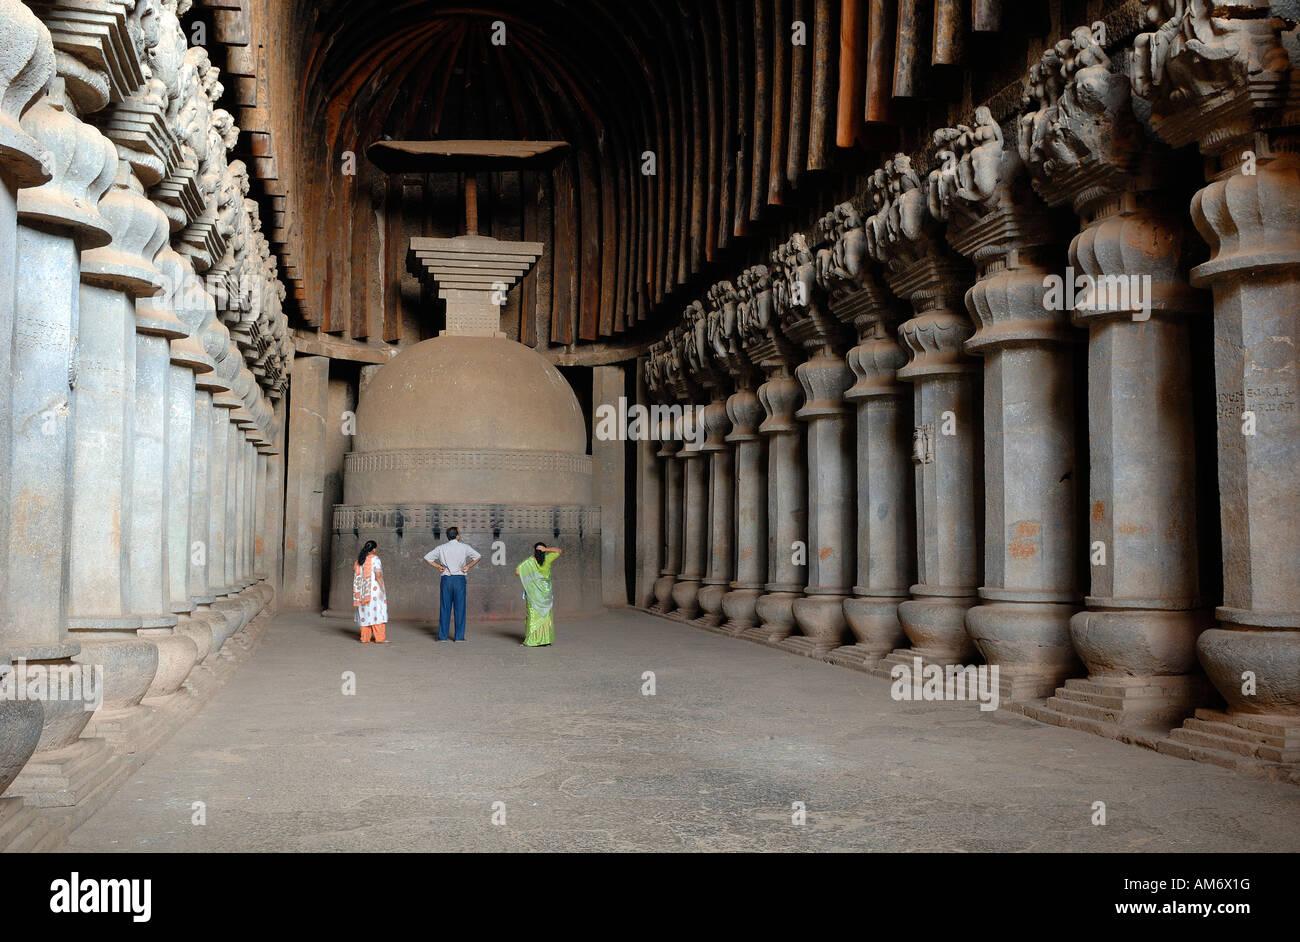 India, Karnataka, 2nd century BC Bhaja grottos - Stock Image